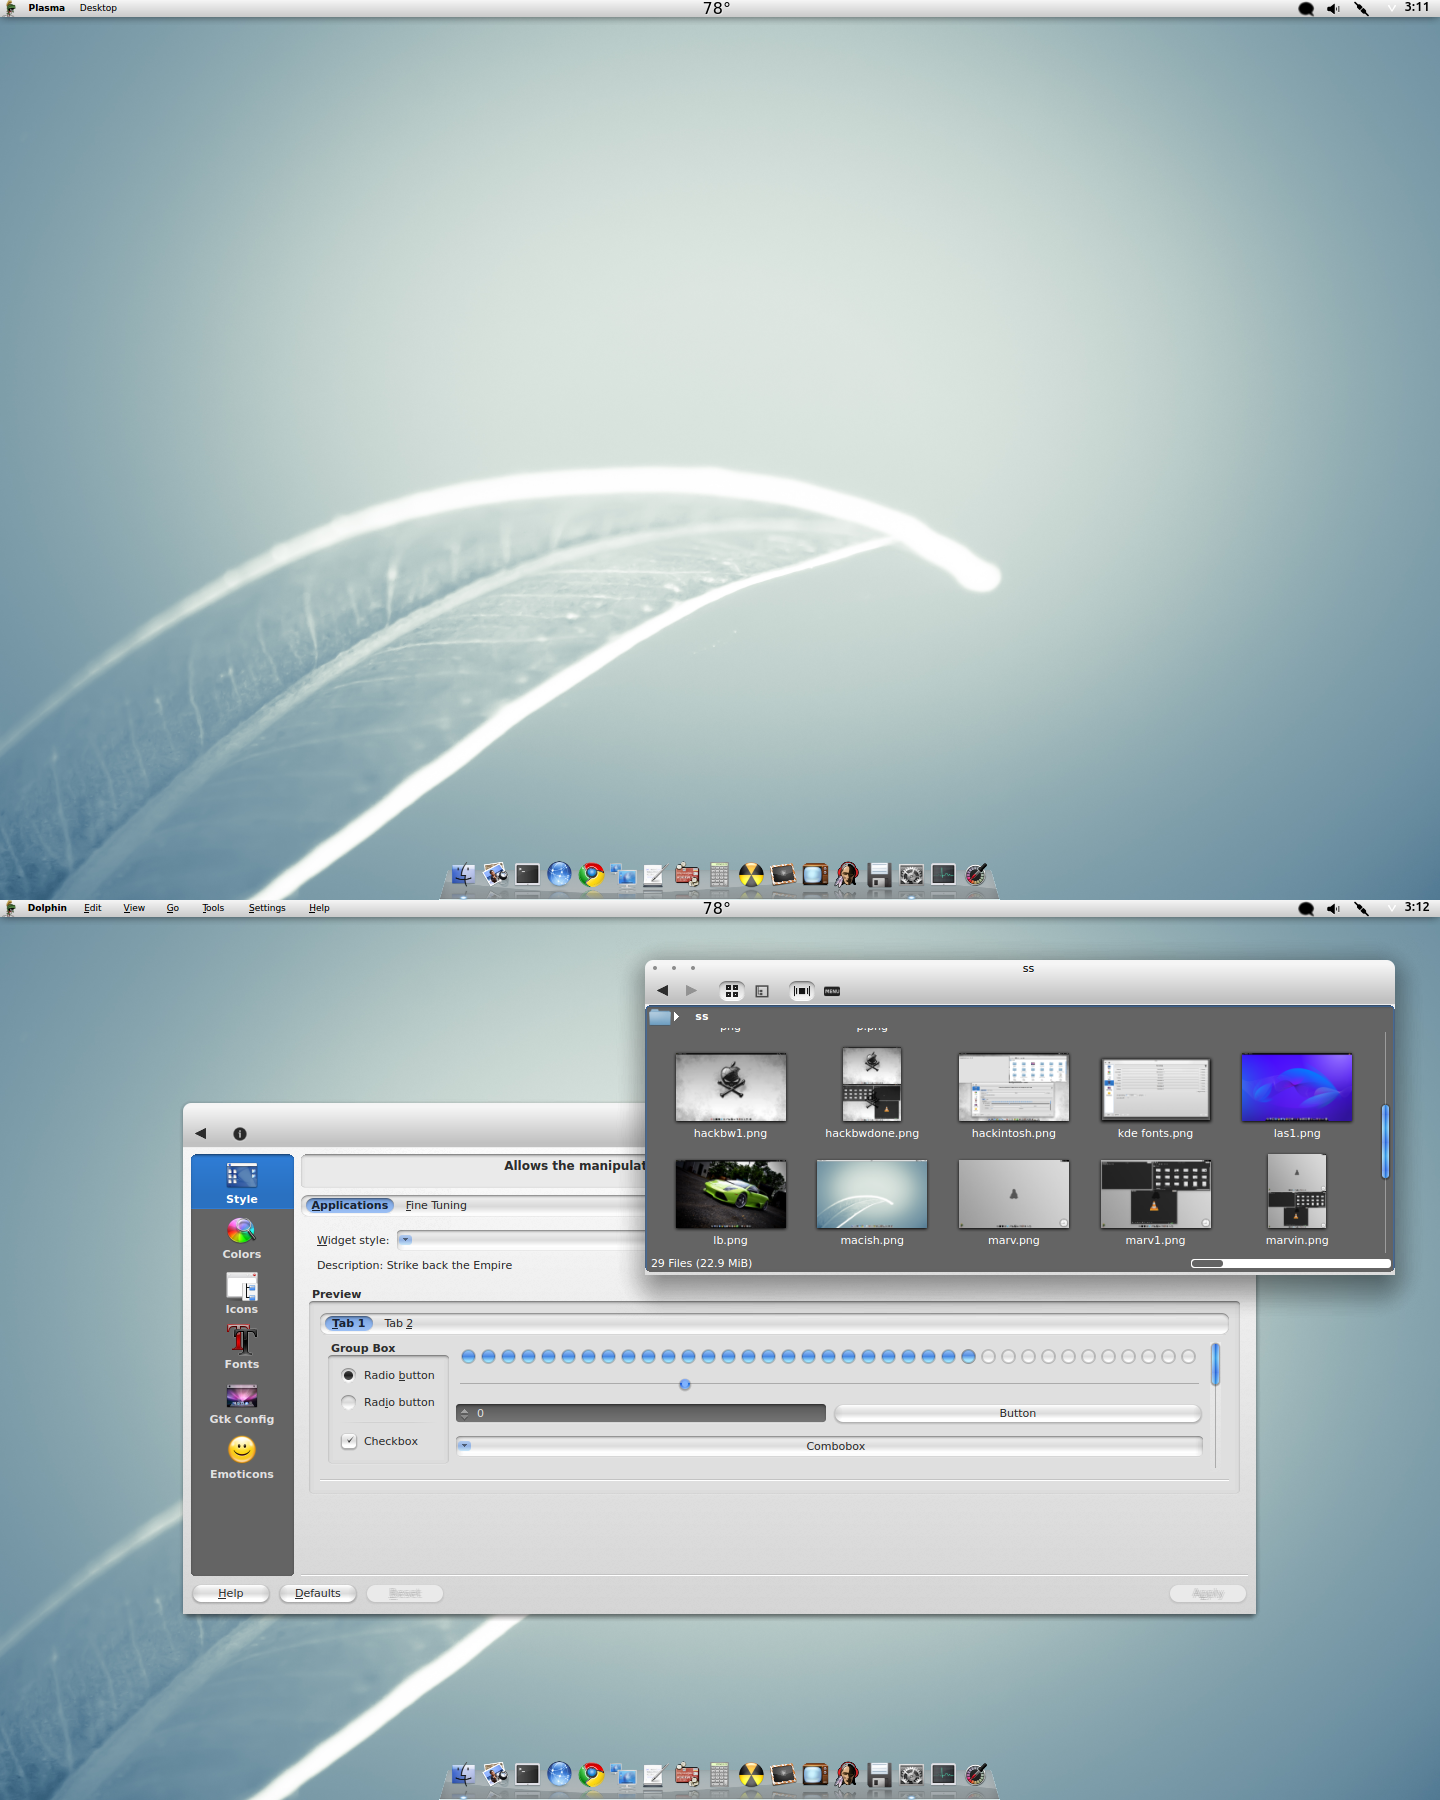 KDE CraazyT Style by CraazyT